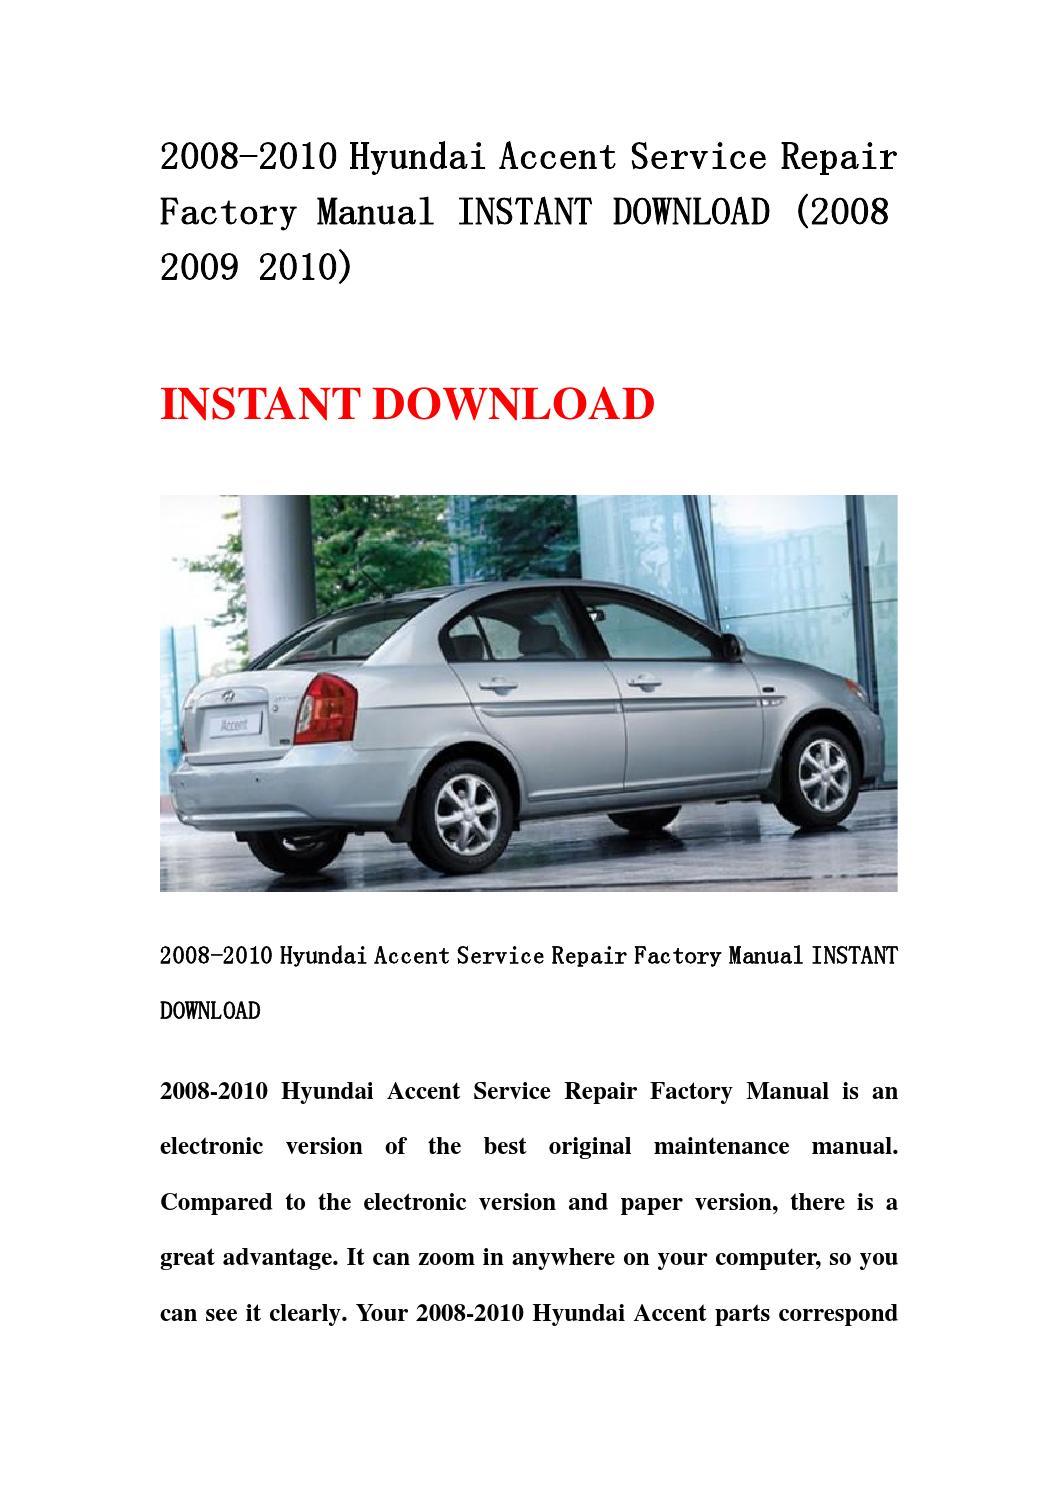 2008 hyundai accent owners manual download